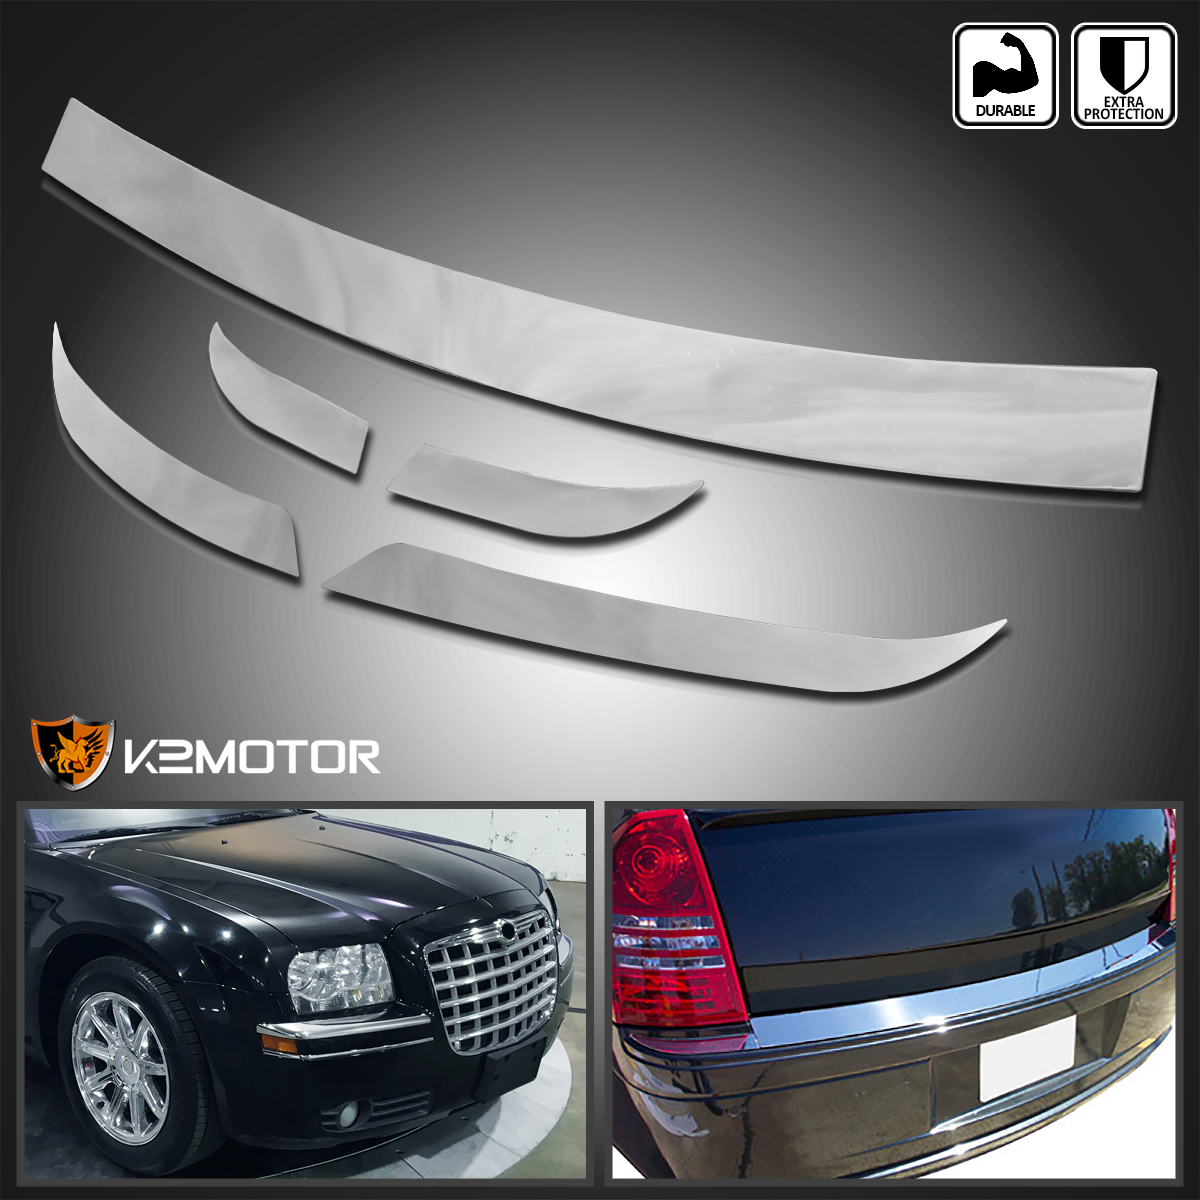 2005 2010 Chrysler 300 Front Rear Chrome Bumper Trim Tb